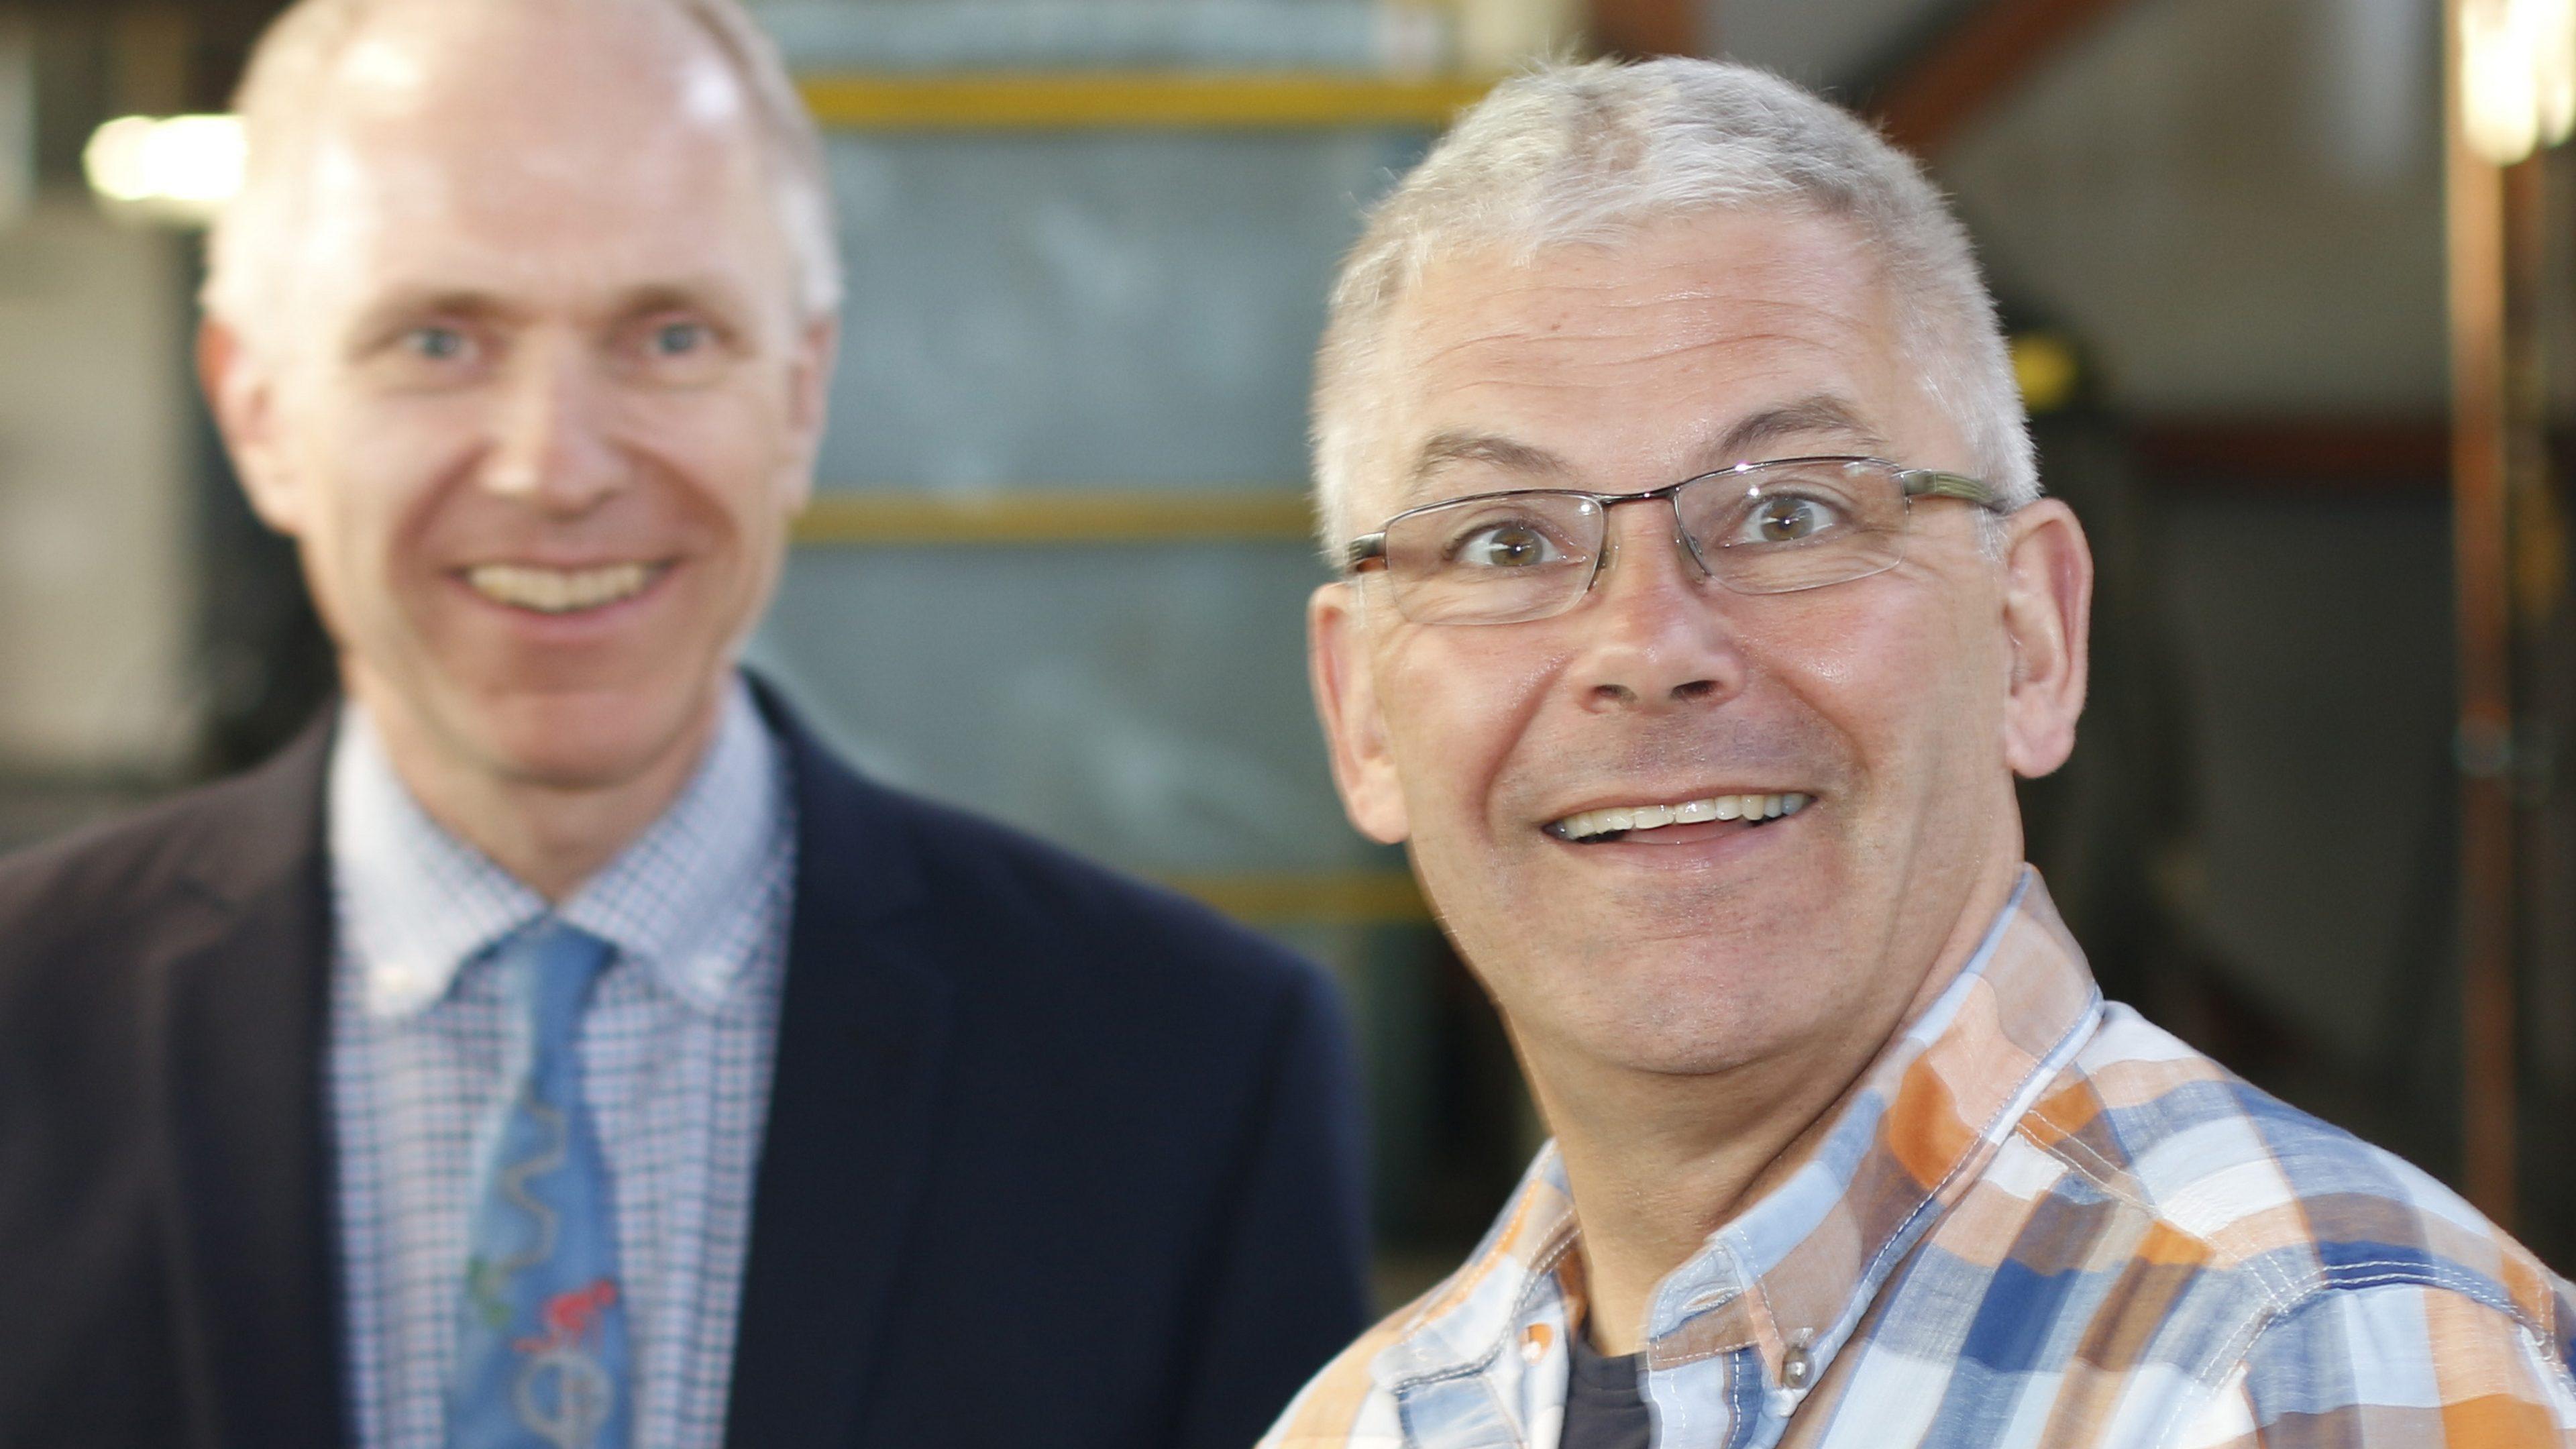 Herr Asbrand, Leiter der Produktion Stahlbau bei Lamparter GmbH & Co. KG.